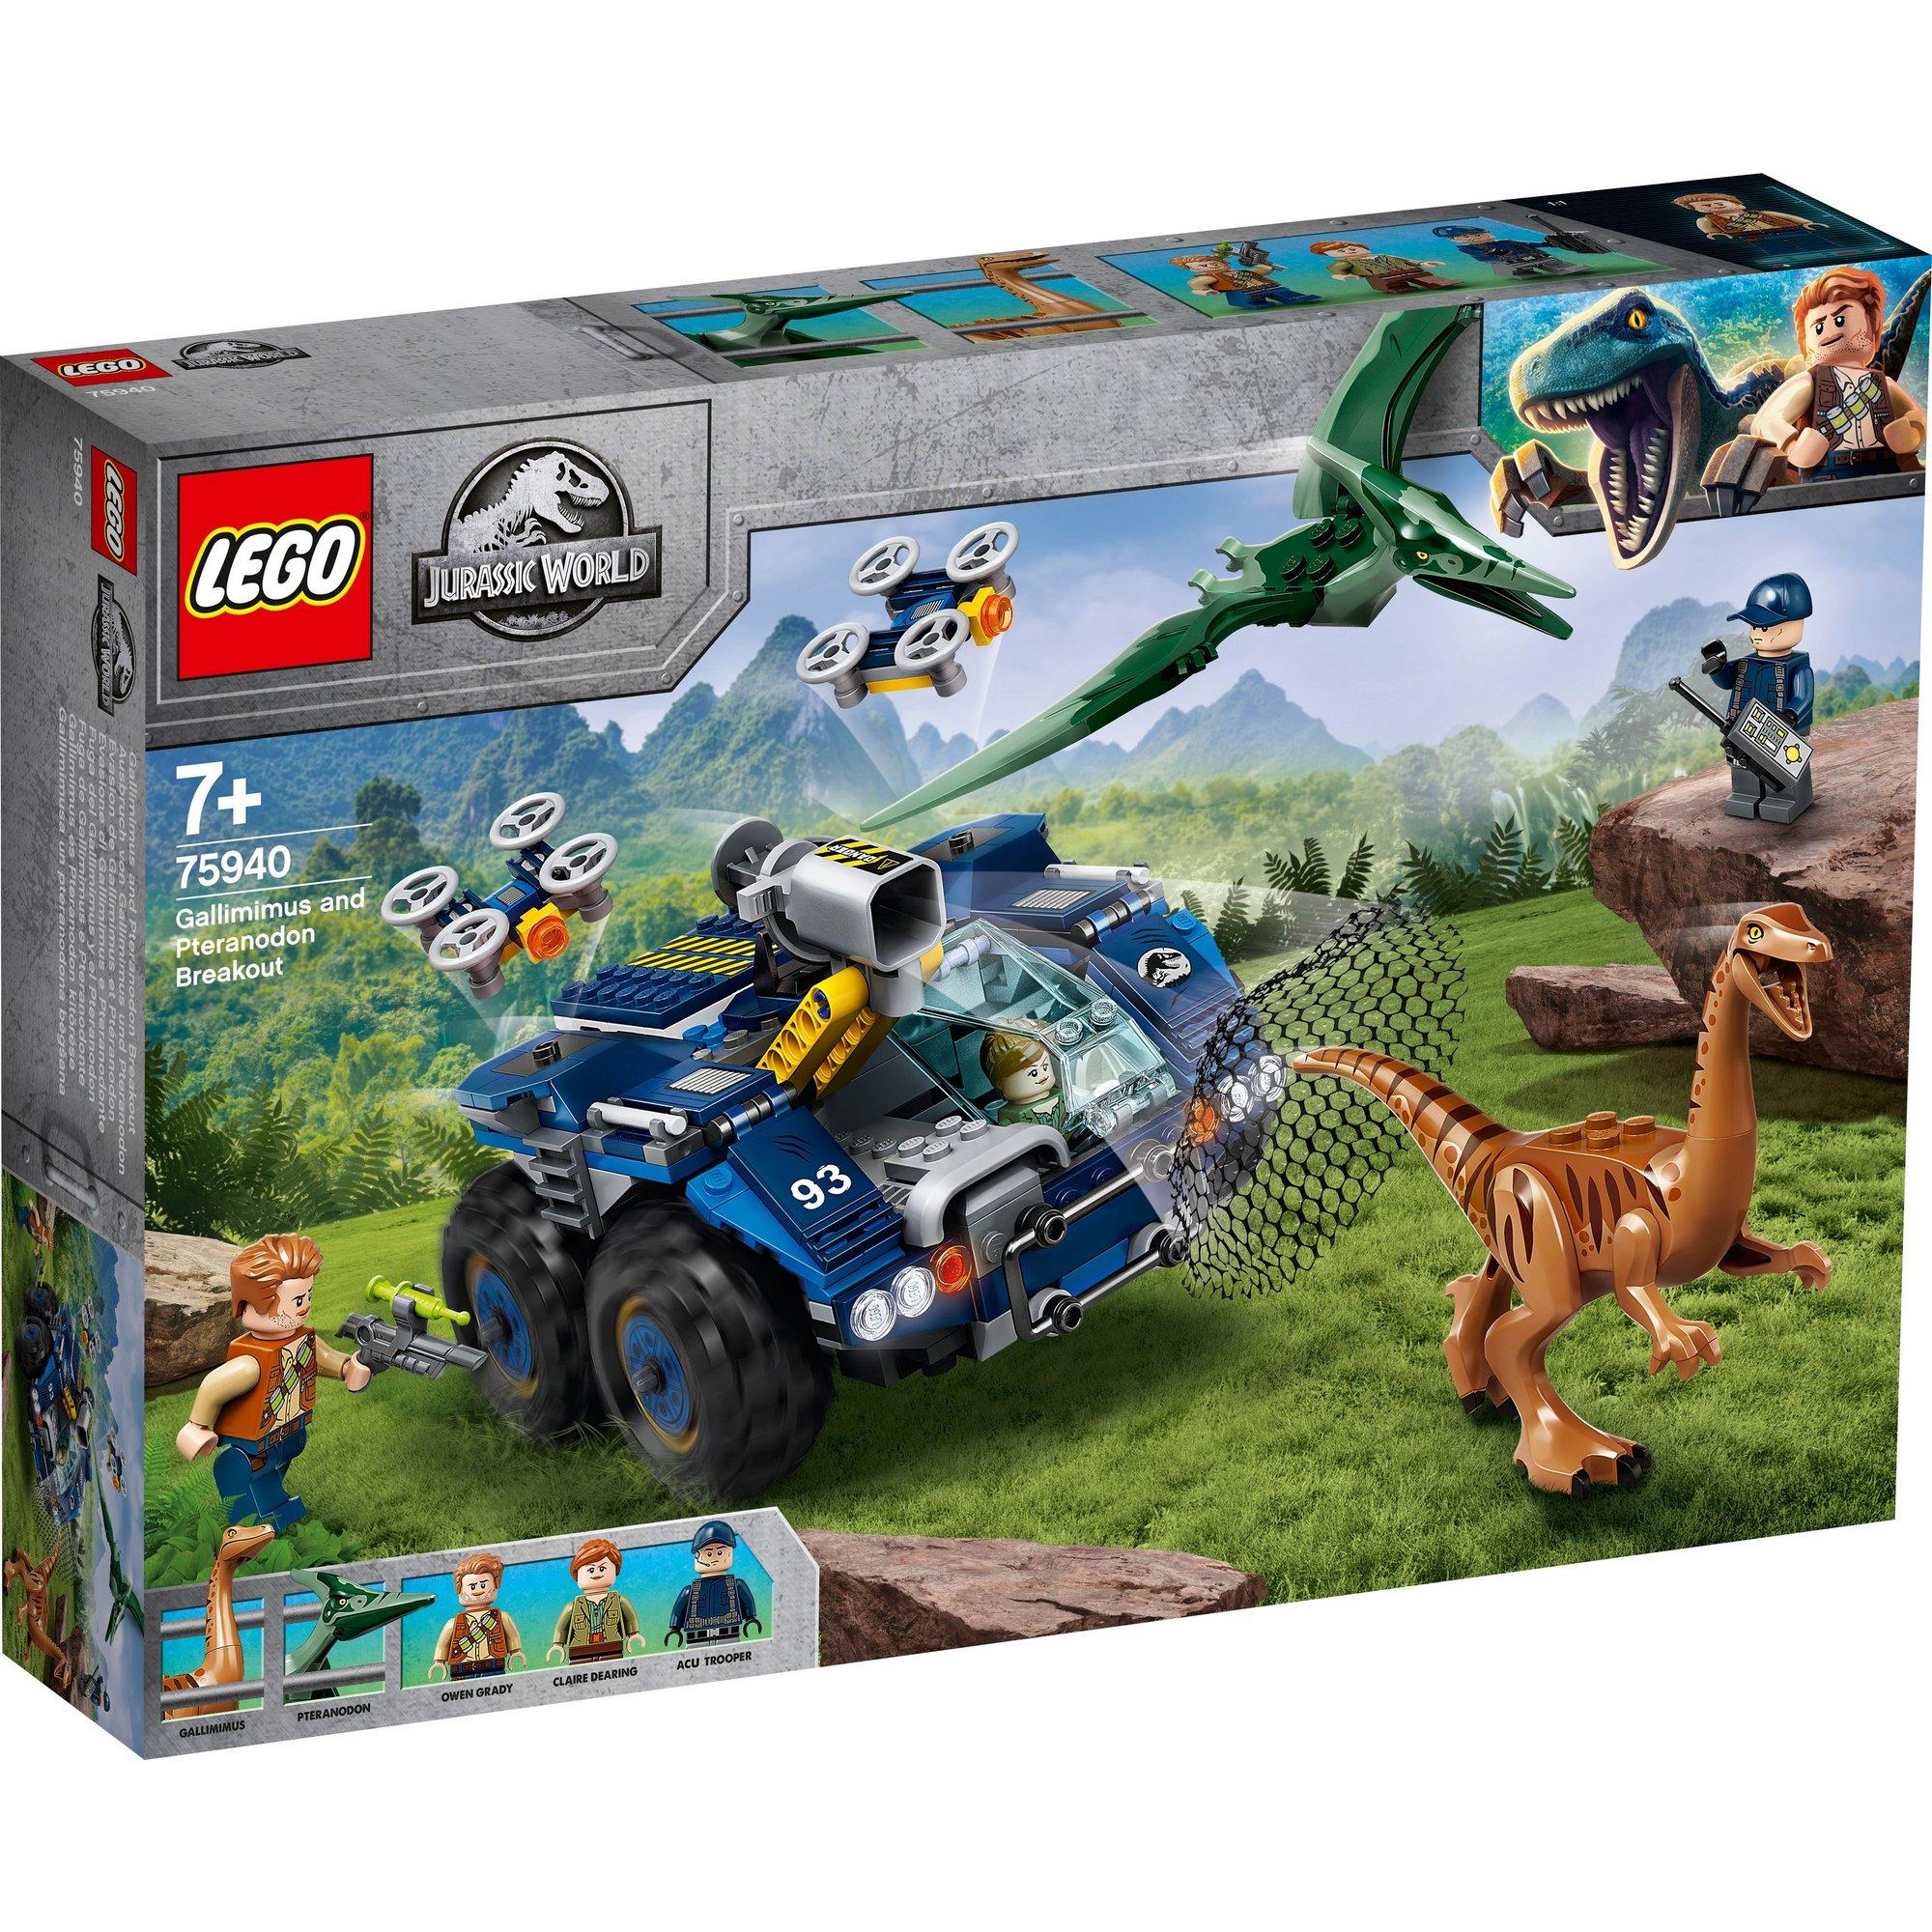 Image of LEGO Jurassic World Gallimimus Pteranodon Breakout